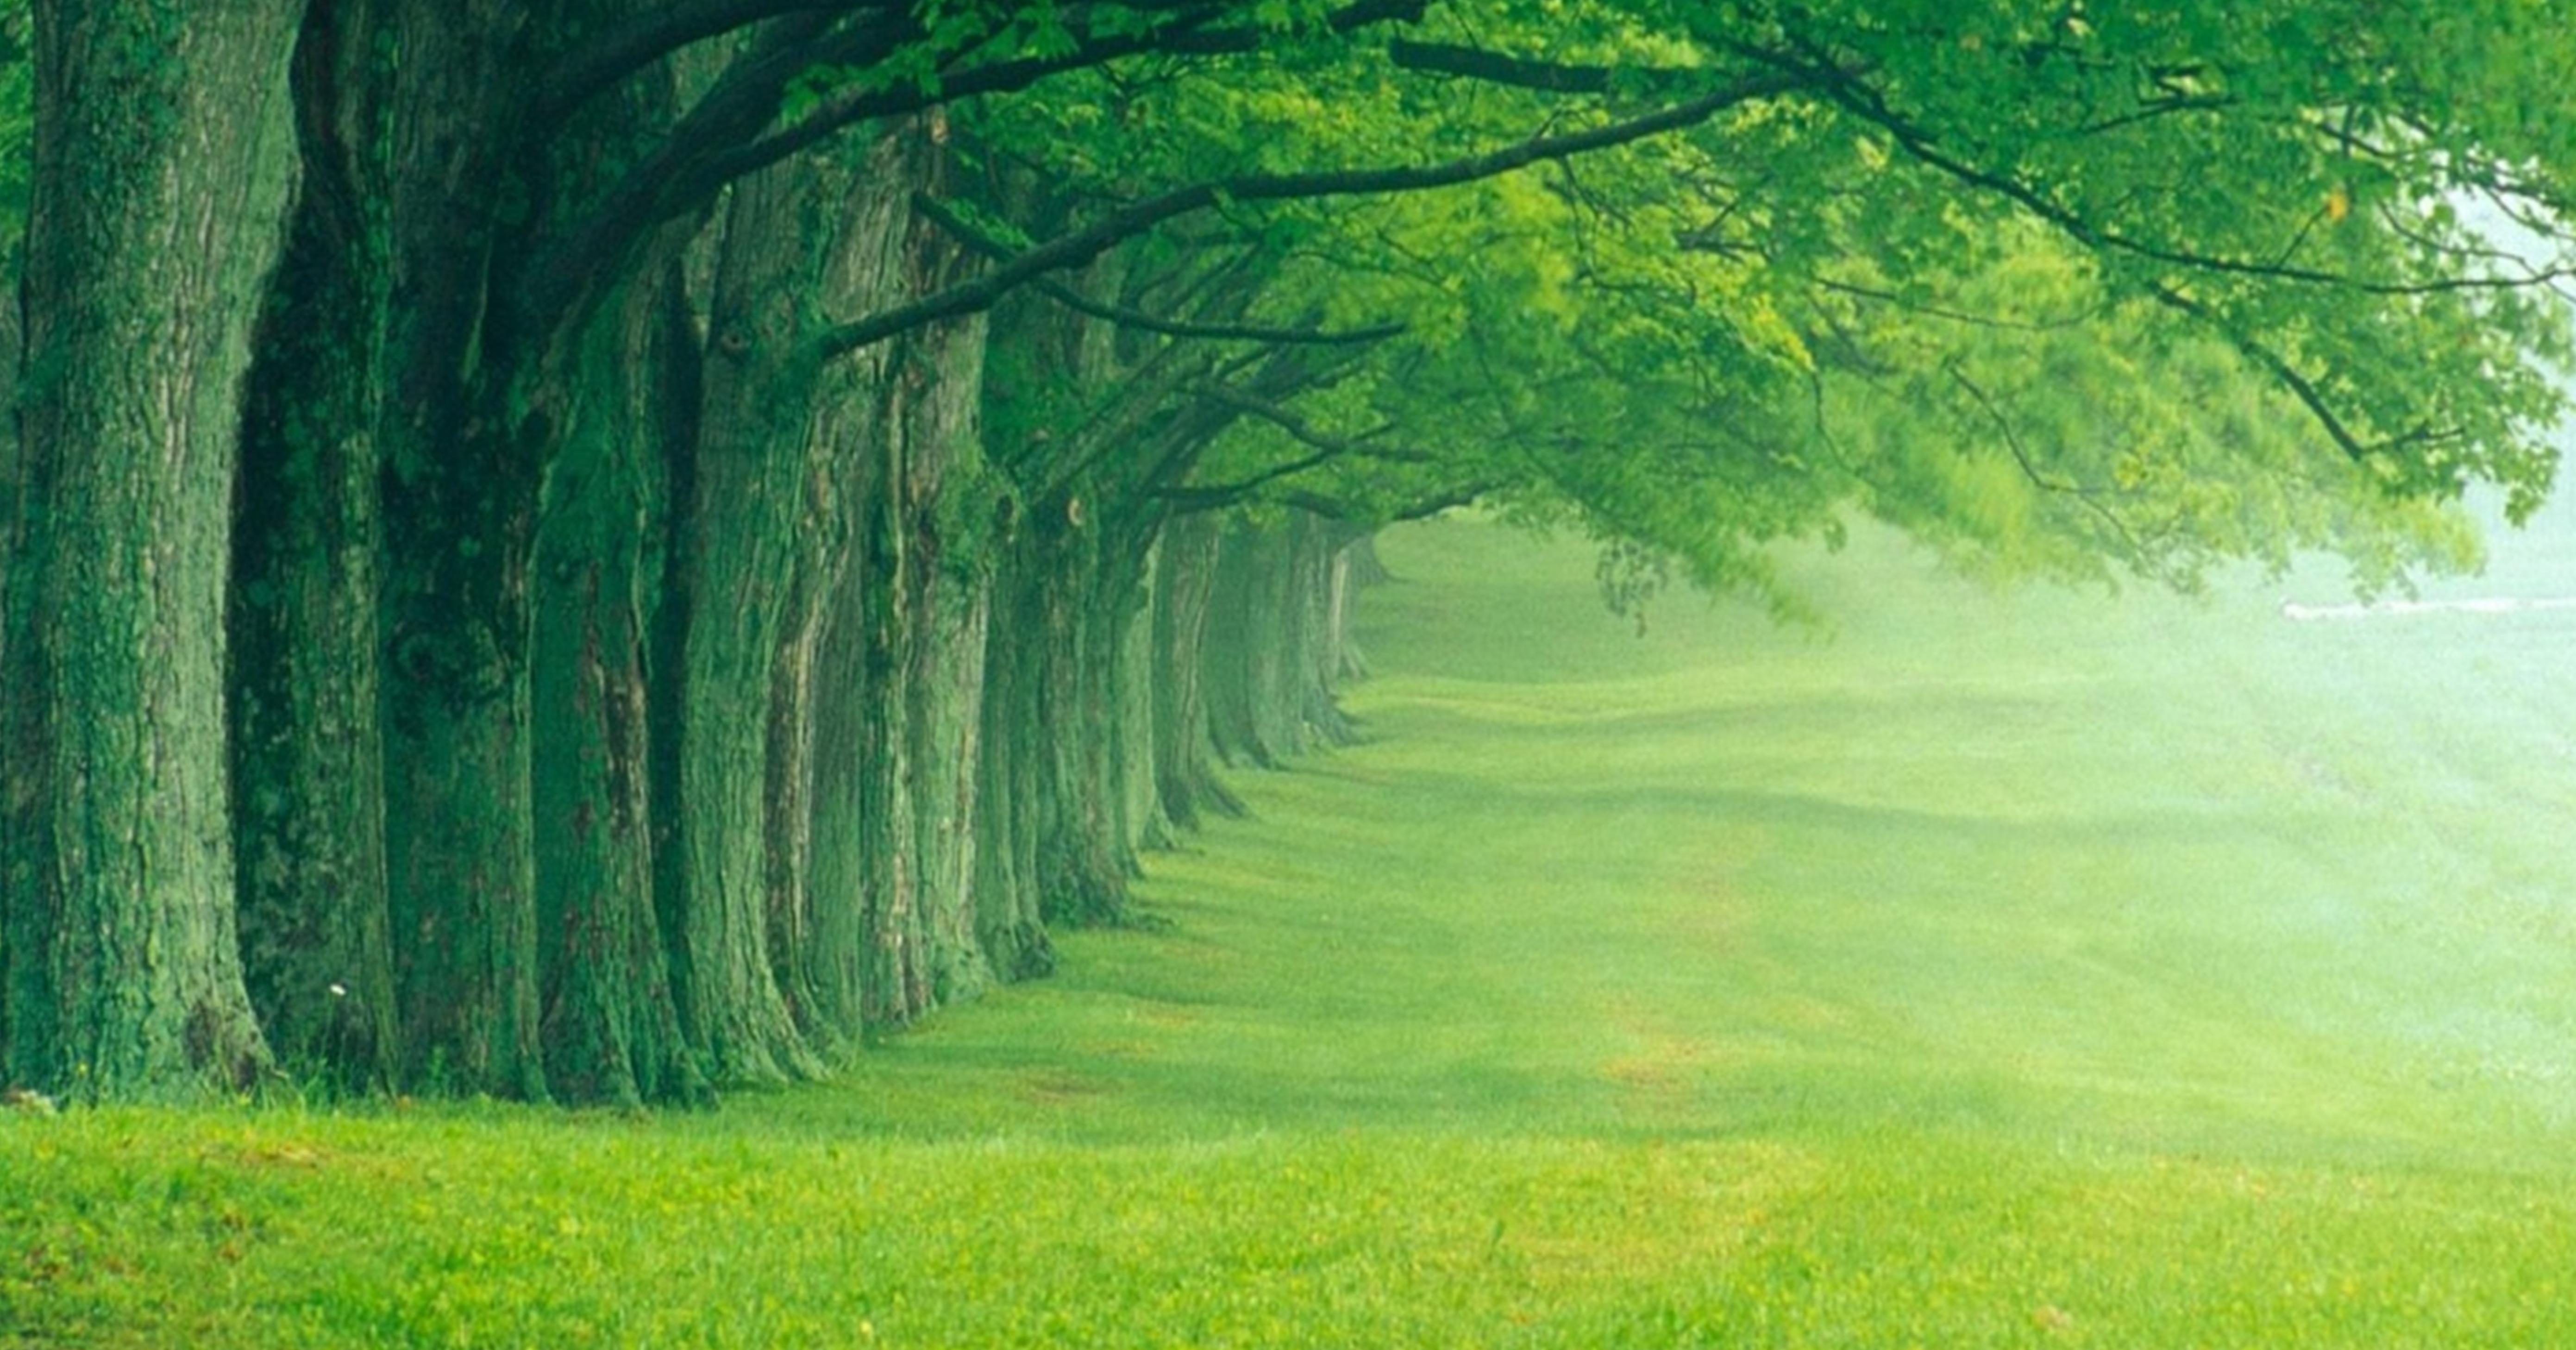 Beautiful Global Nature Wallpapers Fresh Air Sea Sun Rise Grass Green